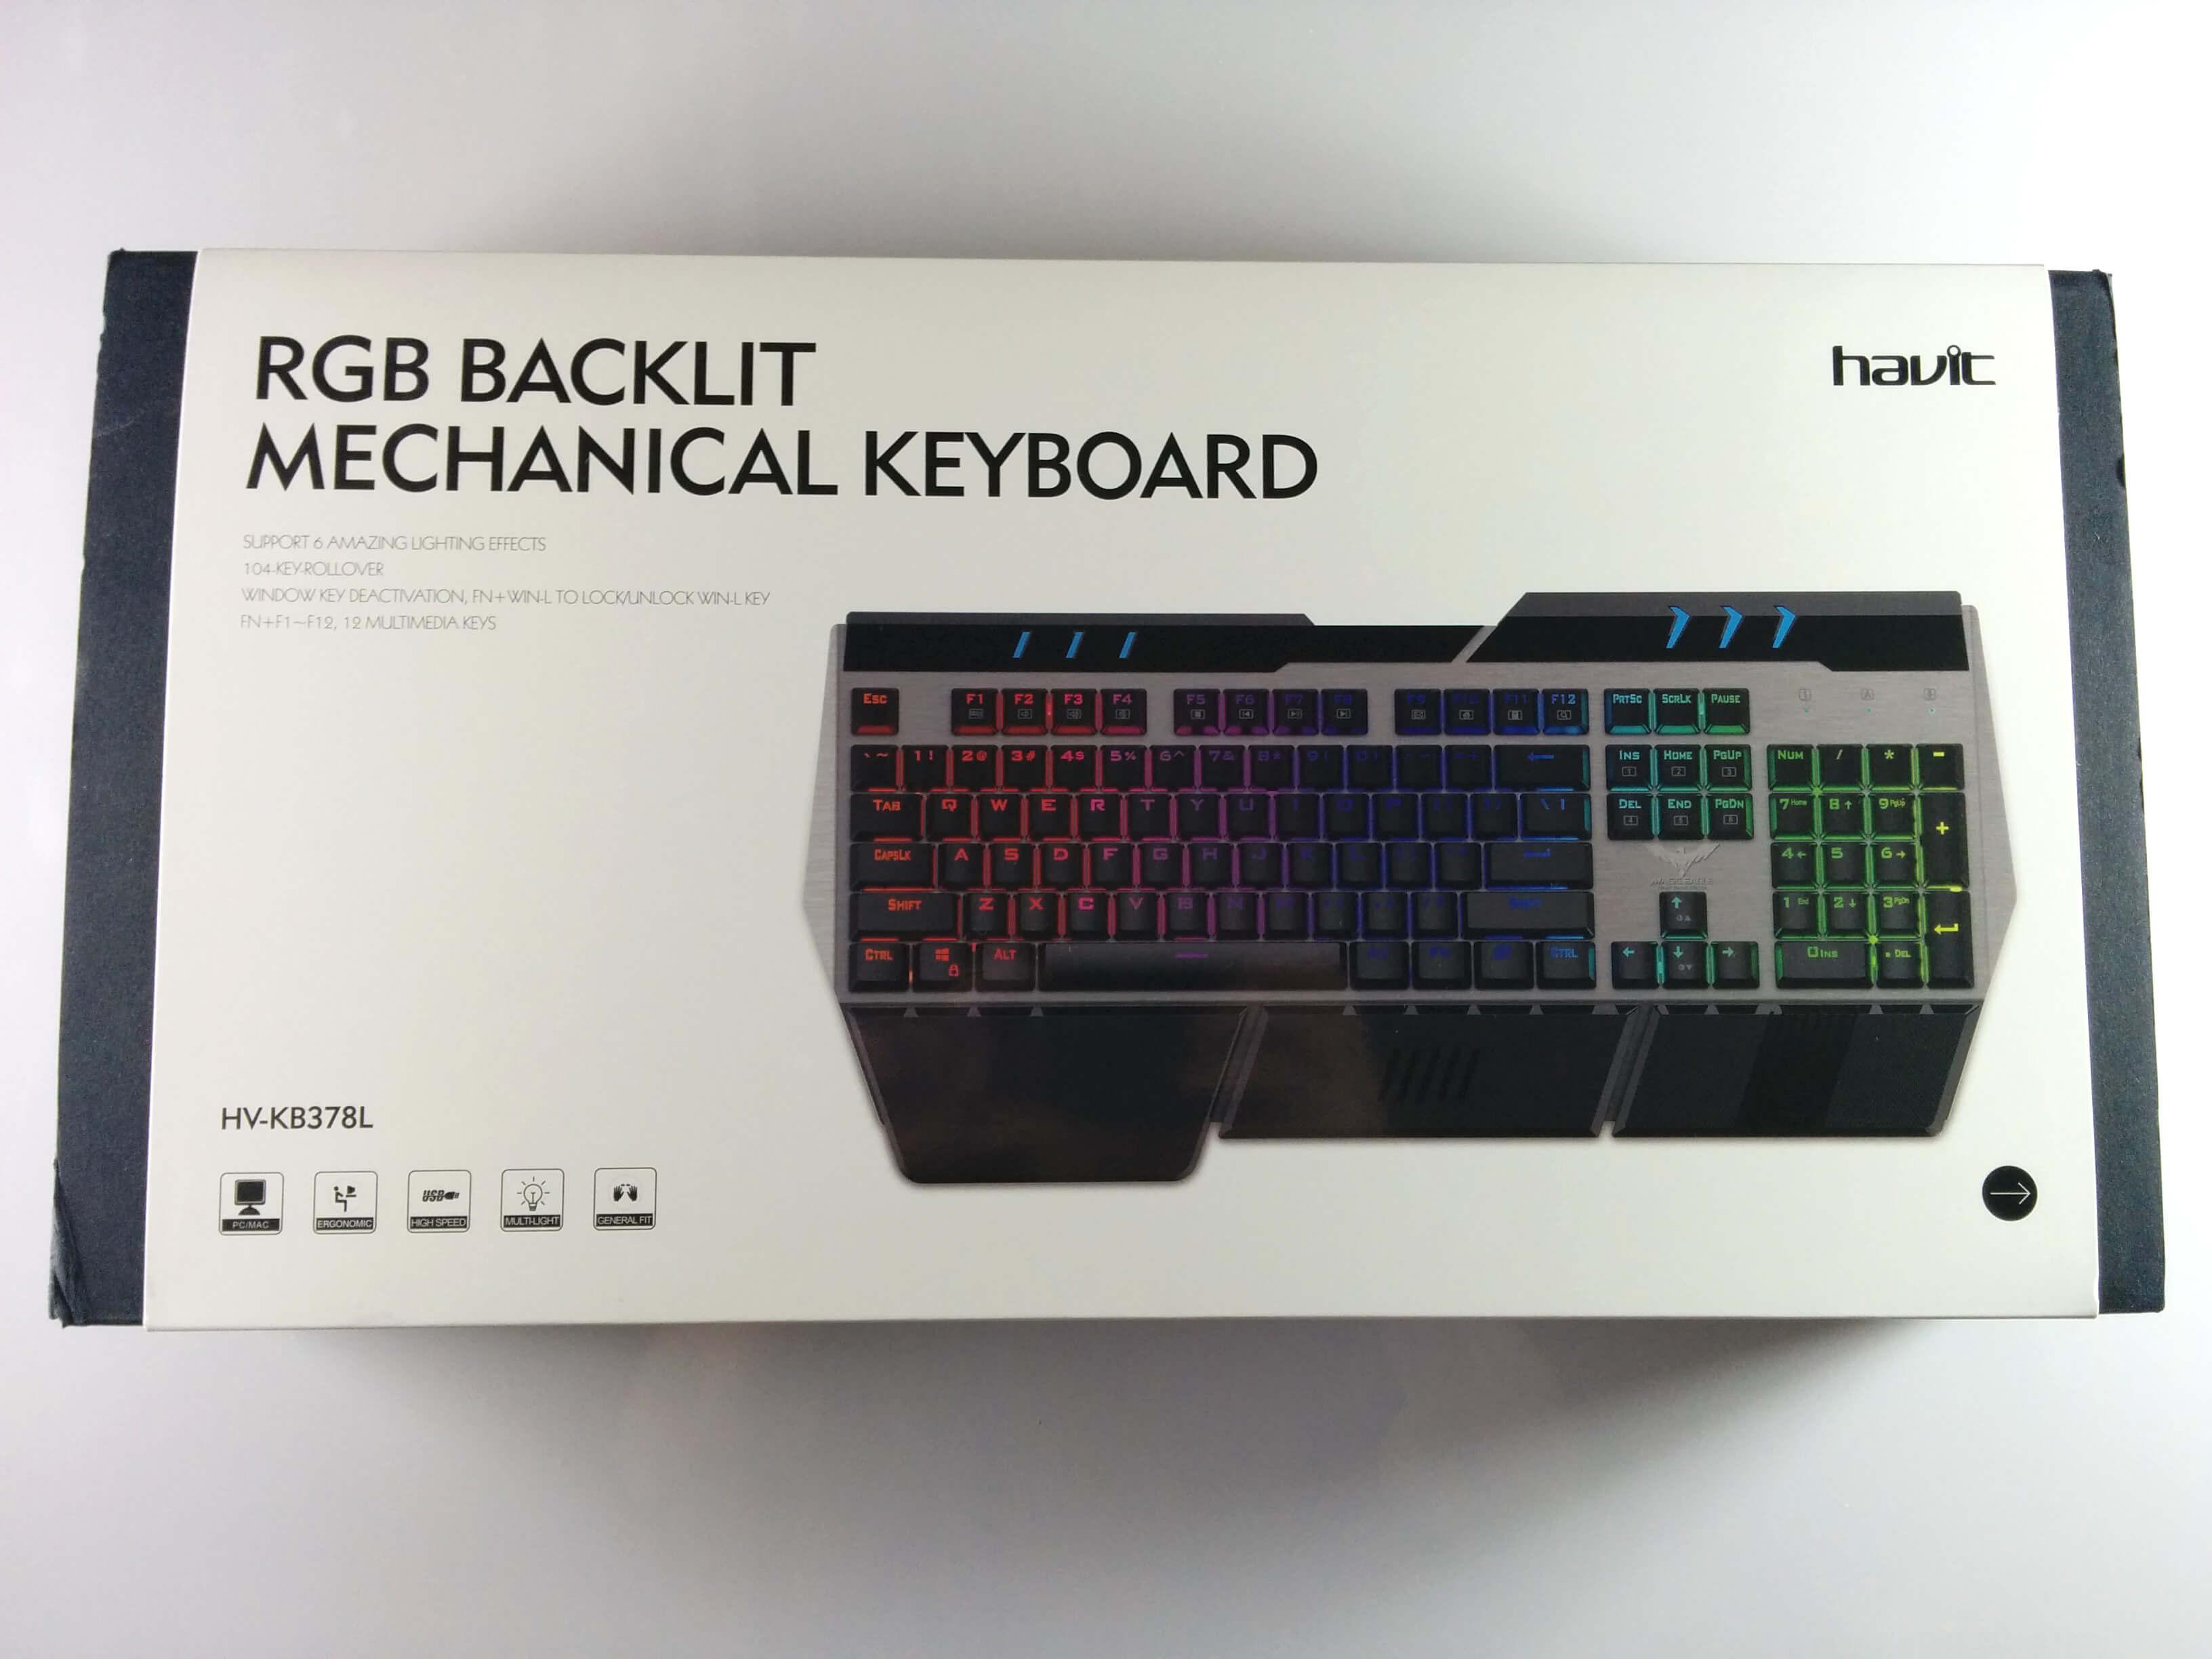 Havit mechanische Tastatur / Keyboard - Karton